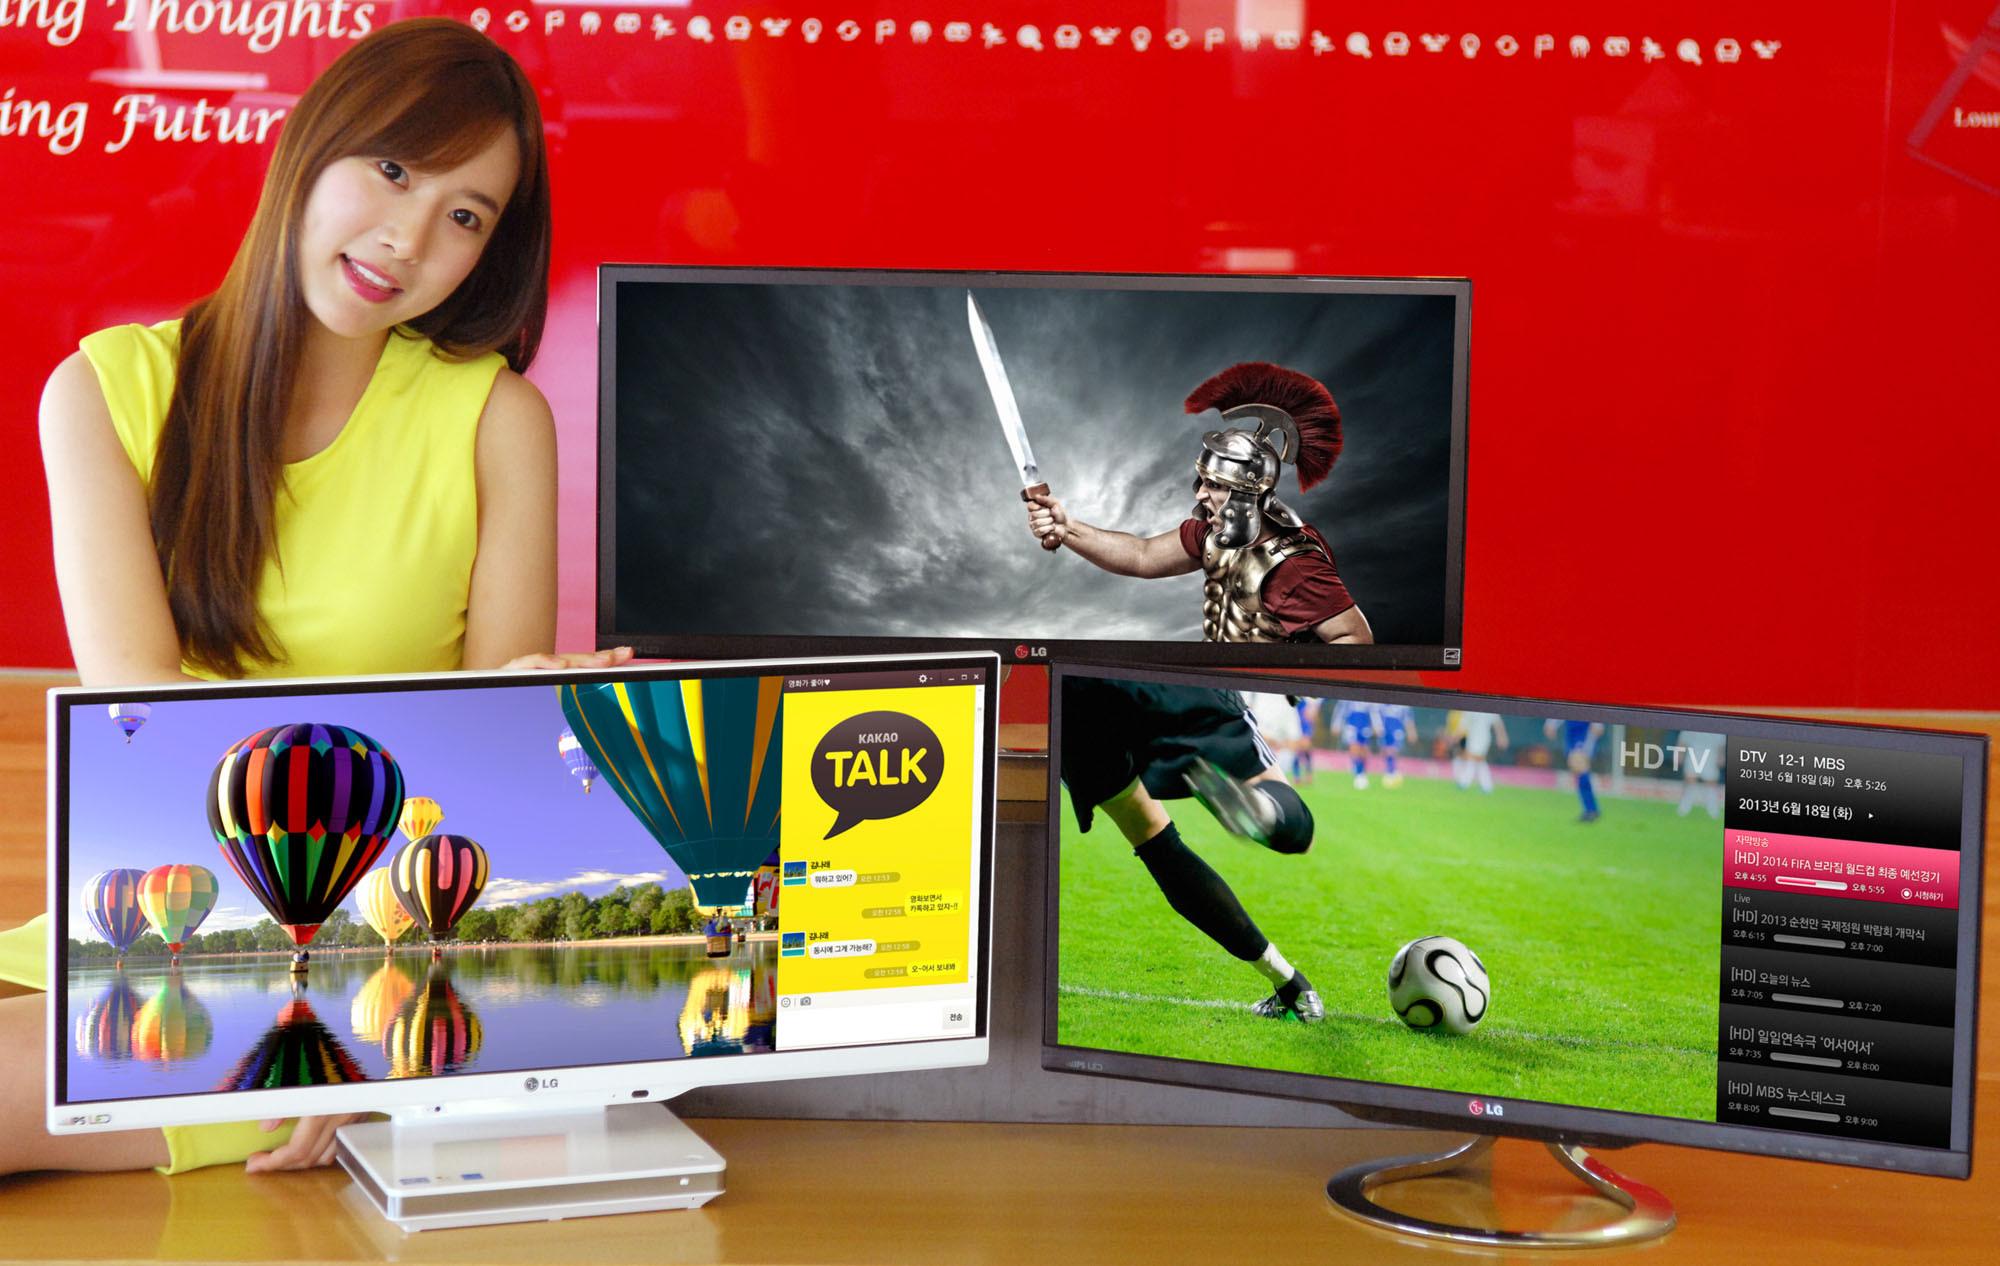 LG V960: Primer All-in-One con pantalla 21:9